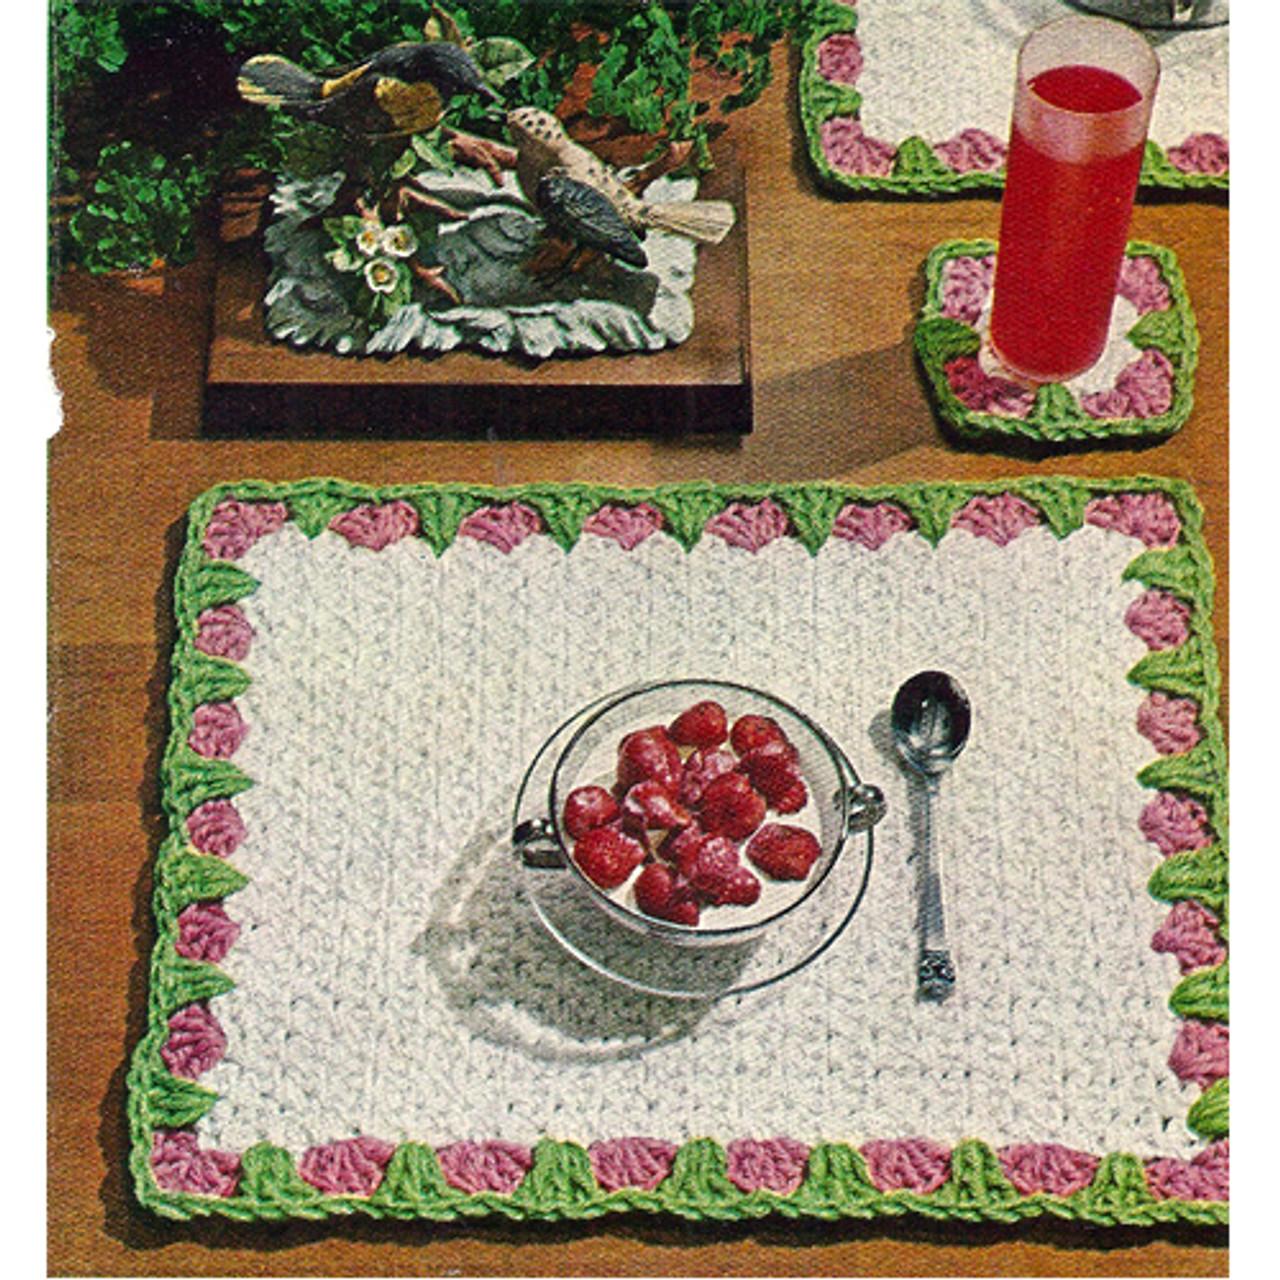 Crochet Crochet Mats Pattern with Floral Border